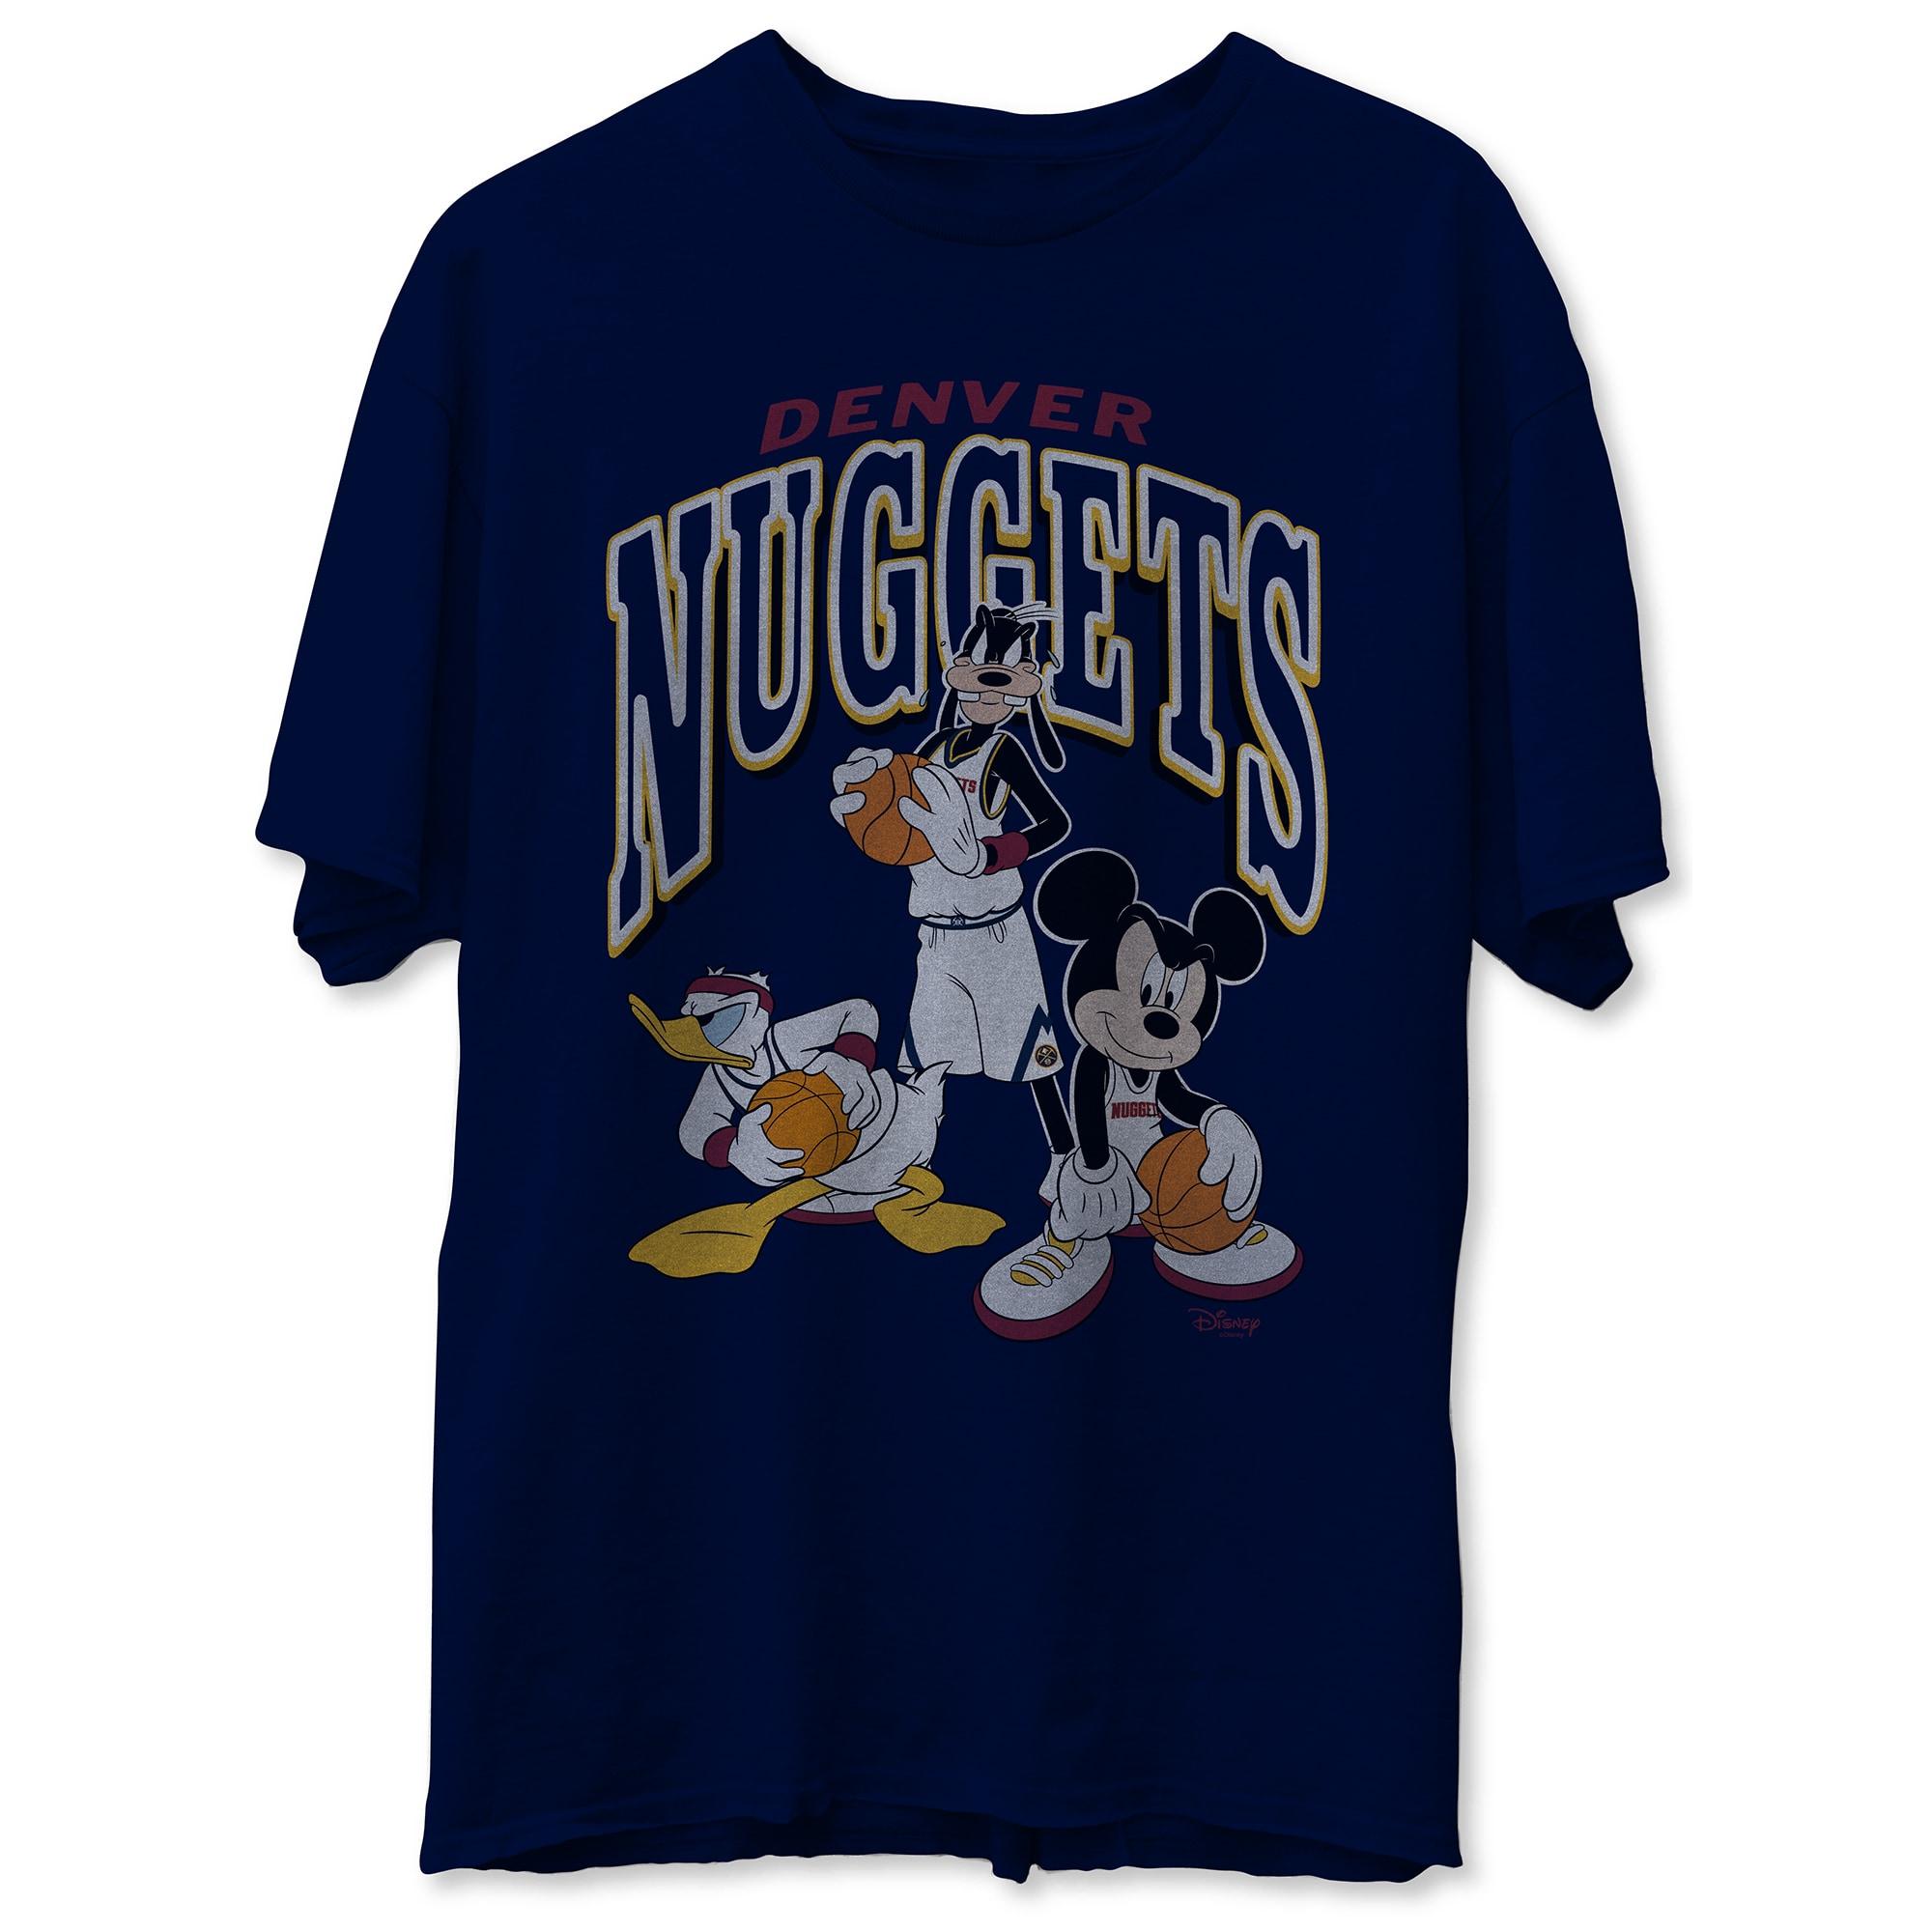 Denver Nuggets Junk Food Disney Mickey Squad T-Shirt - Navy